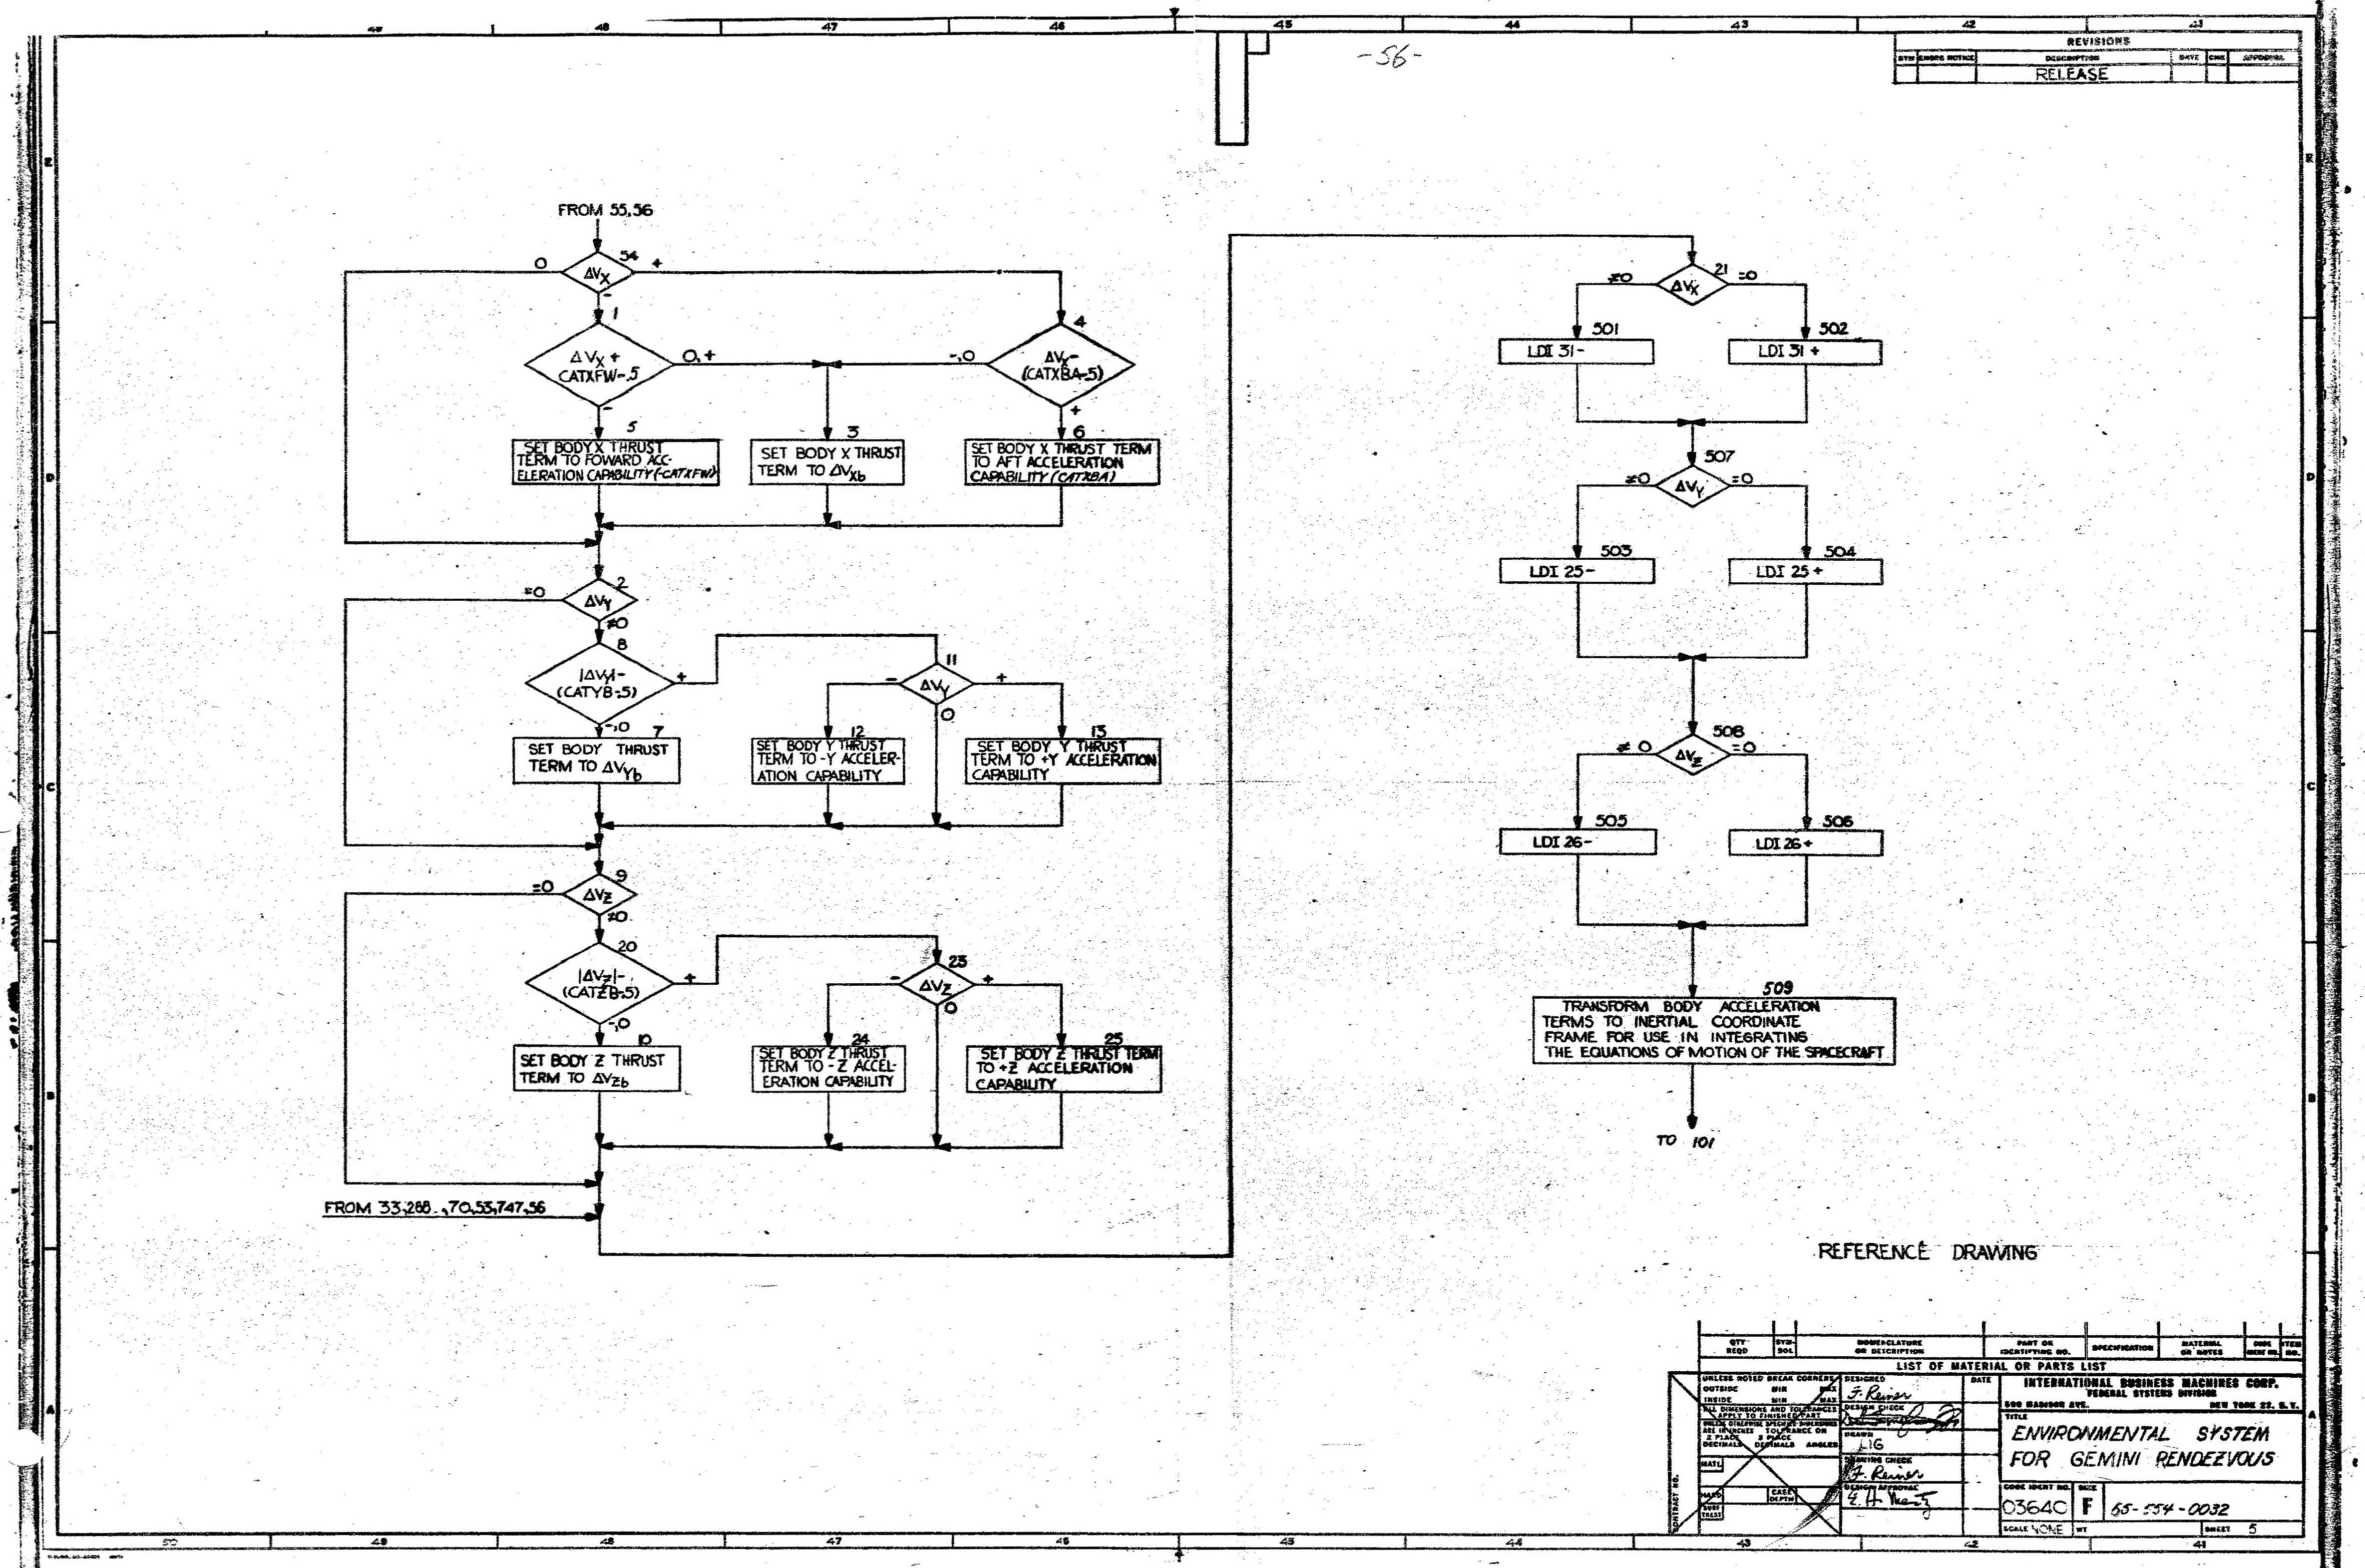 Apollo 125cc Electrical Schematic Schematics Data Wiring Diagrams Ssr Pit Bike Diagram Dirt Wire For 1997 F150 4x4 70cc